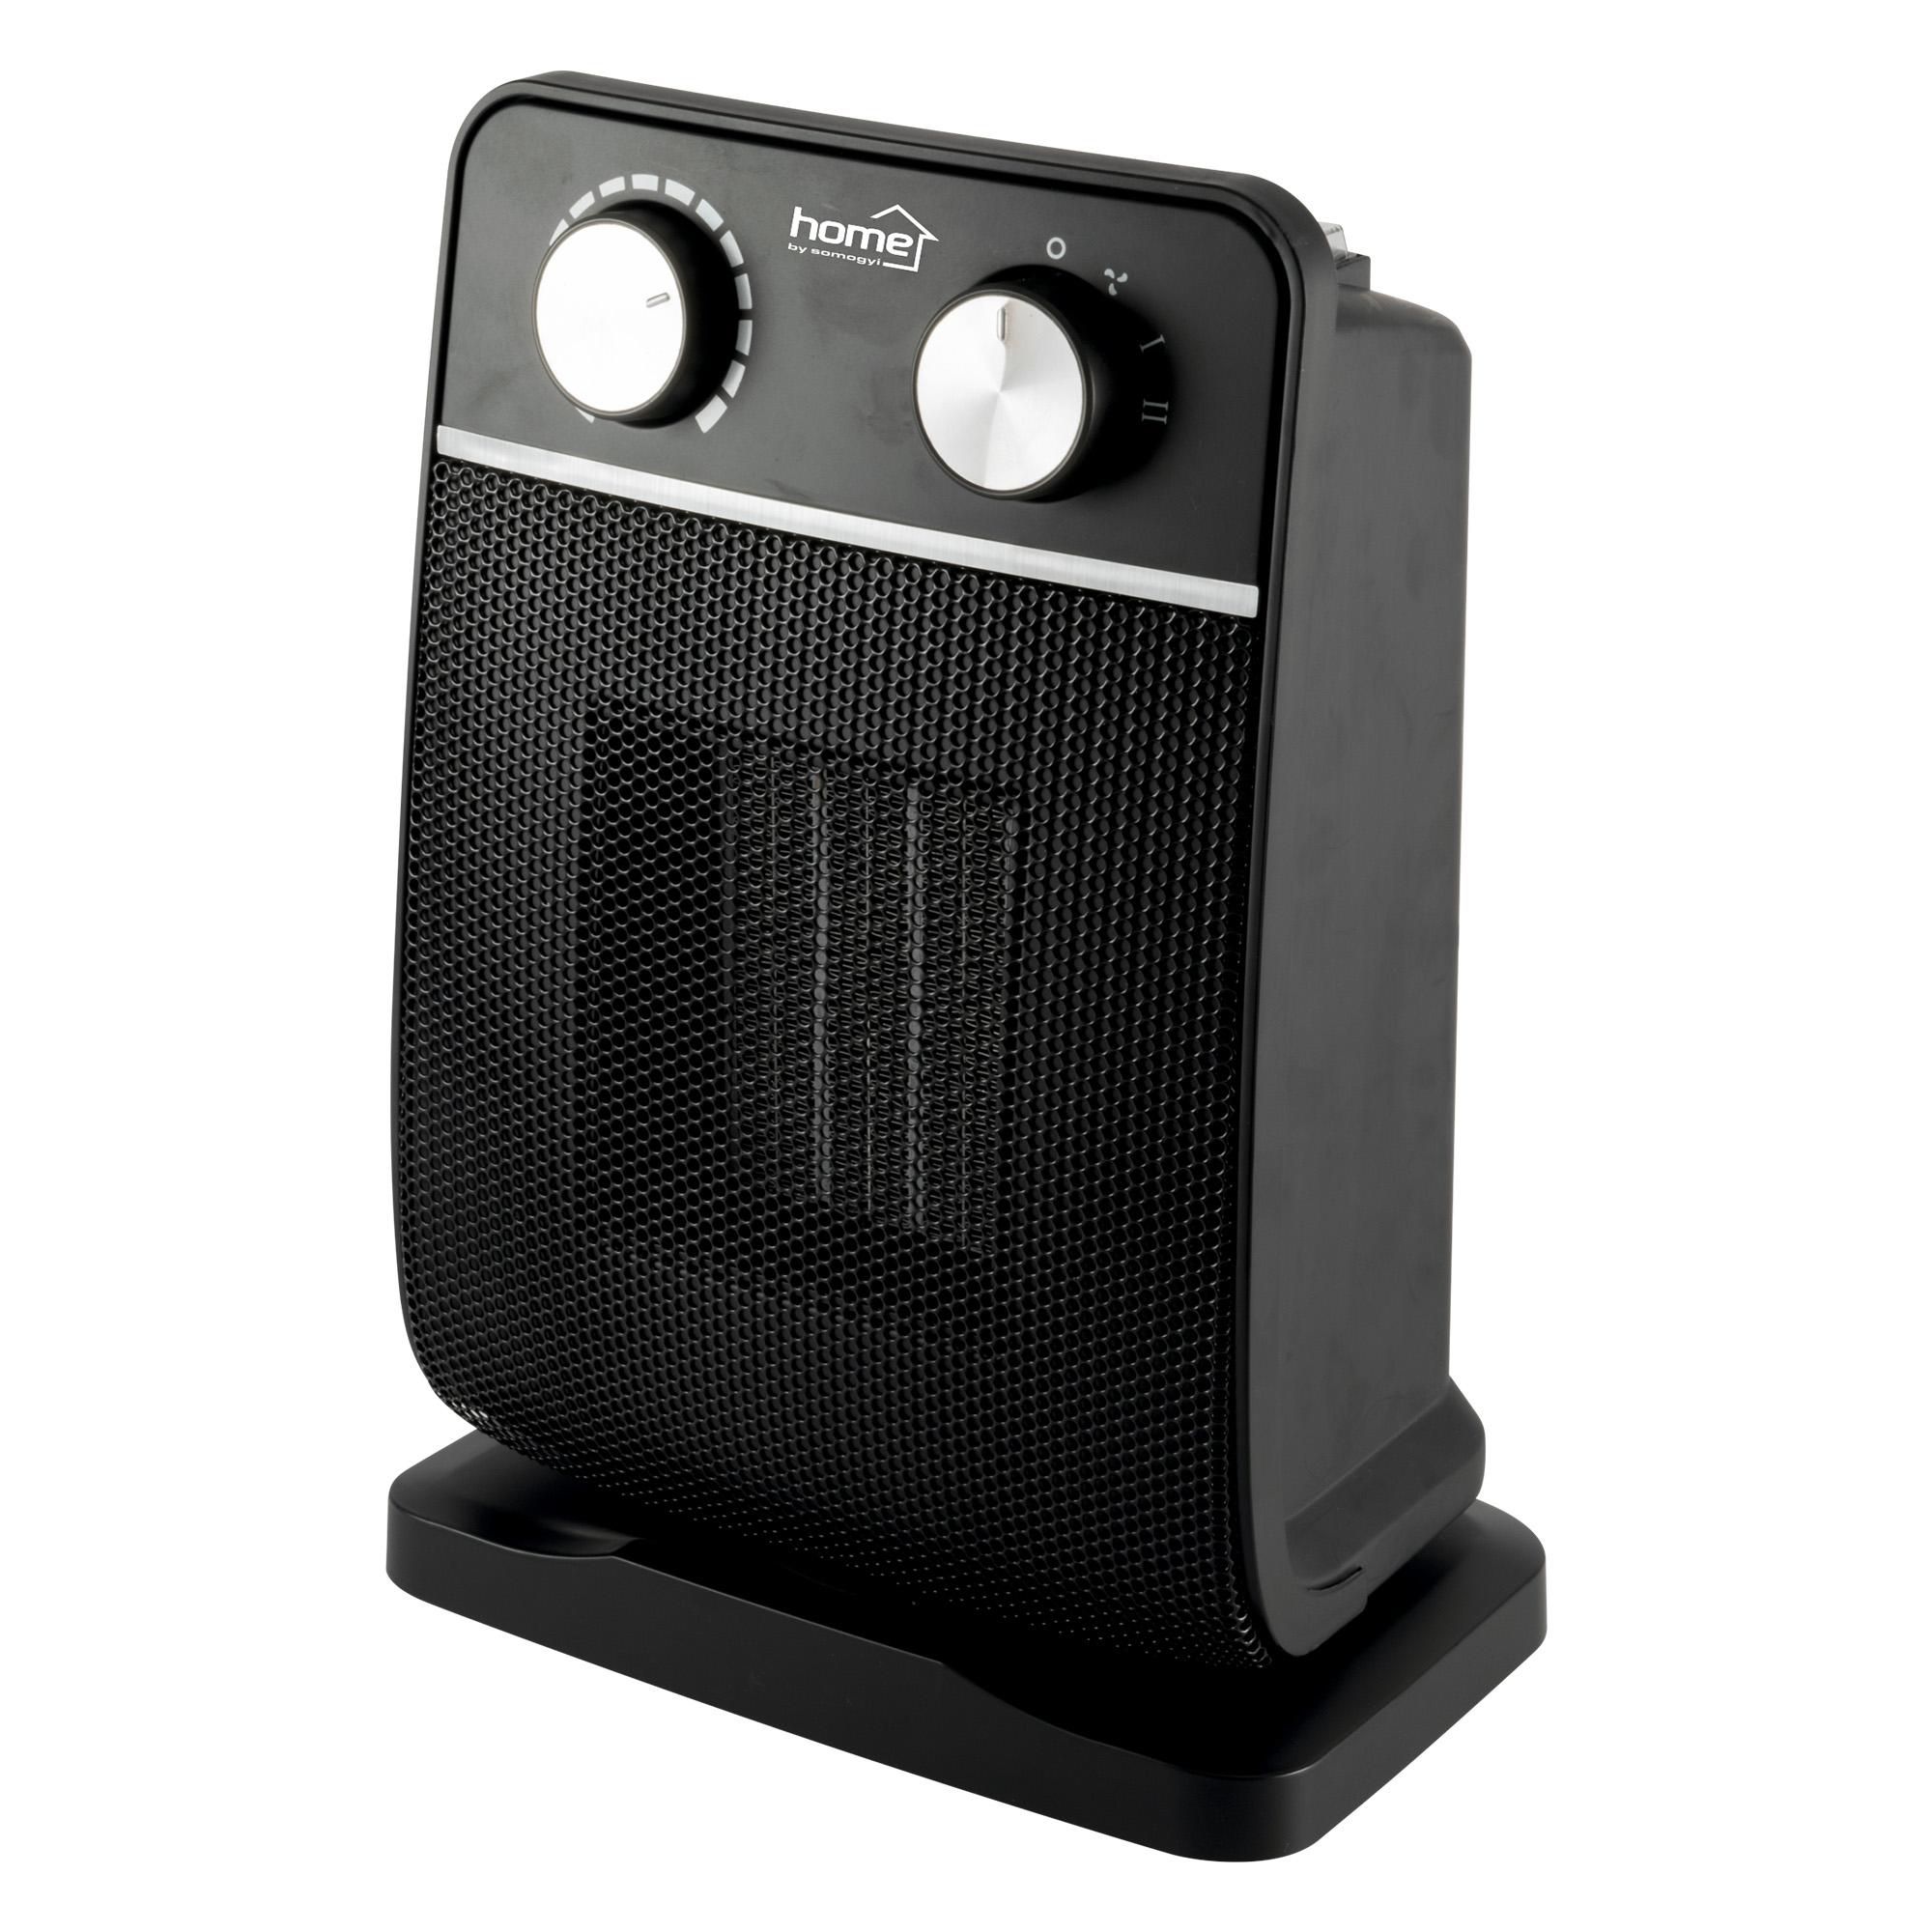 Radiator electric ceramic FK 29 Home by Somogyi, 1800 W, 2 trepte, termostat incorporat, oprire automata la rasturnare, IP20, 22 x 32 x 14,5 cm imagine 2021 mathaus